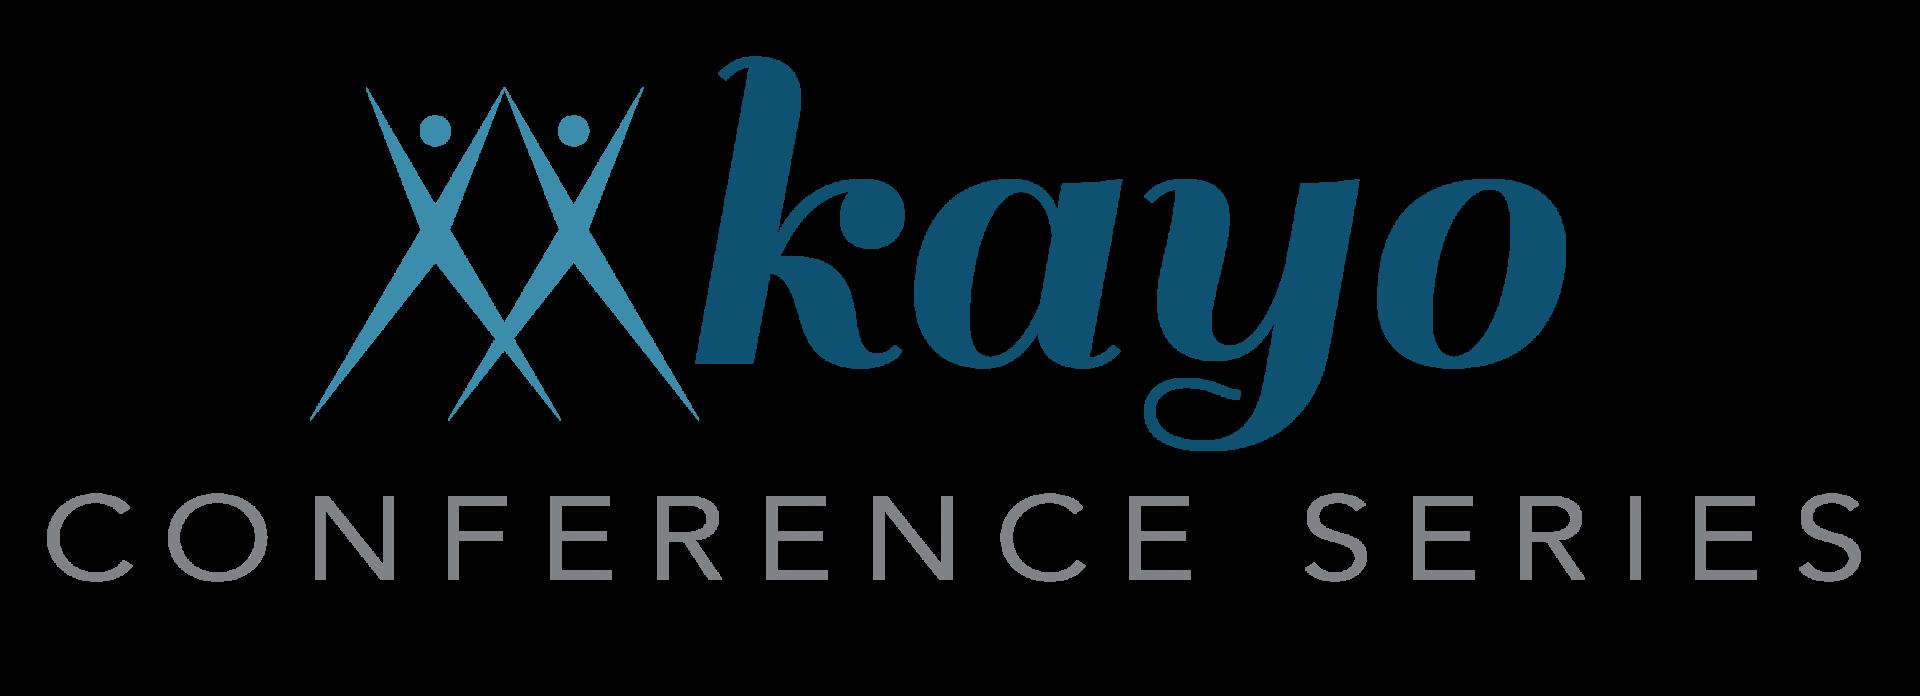 Kayo Conference Series